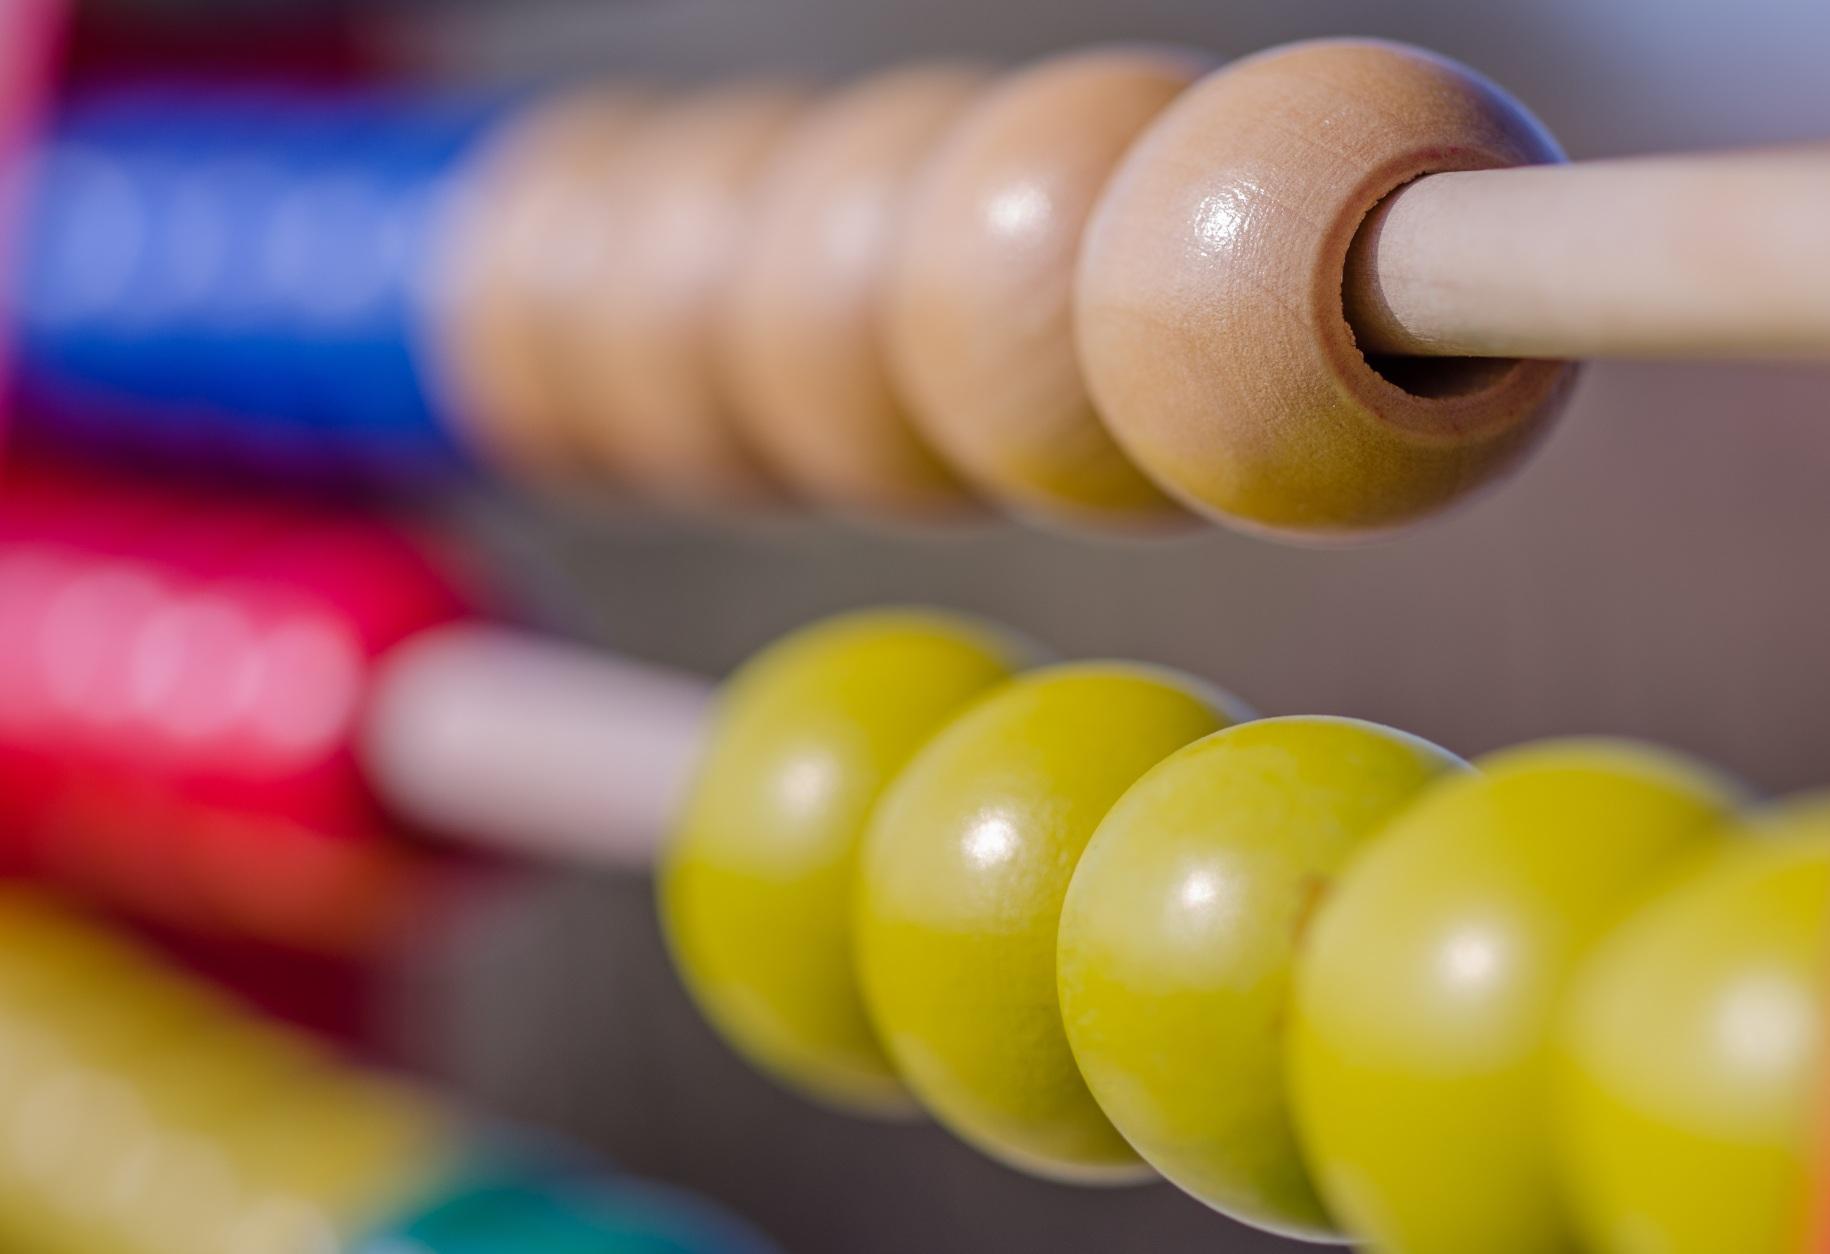 abacus-1069213 (cc0)